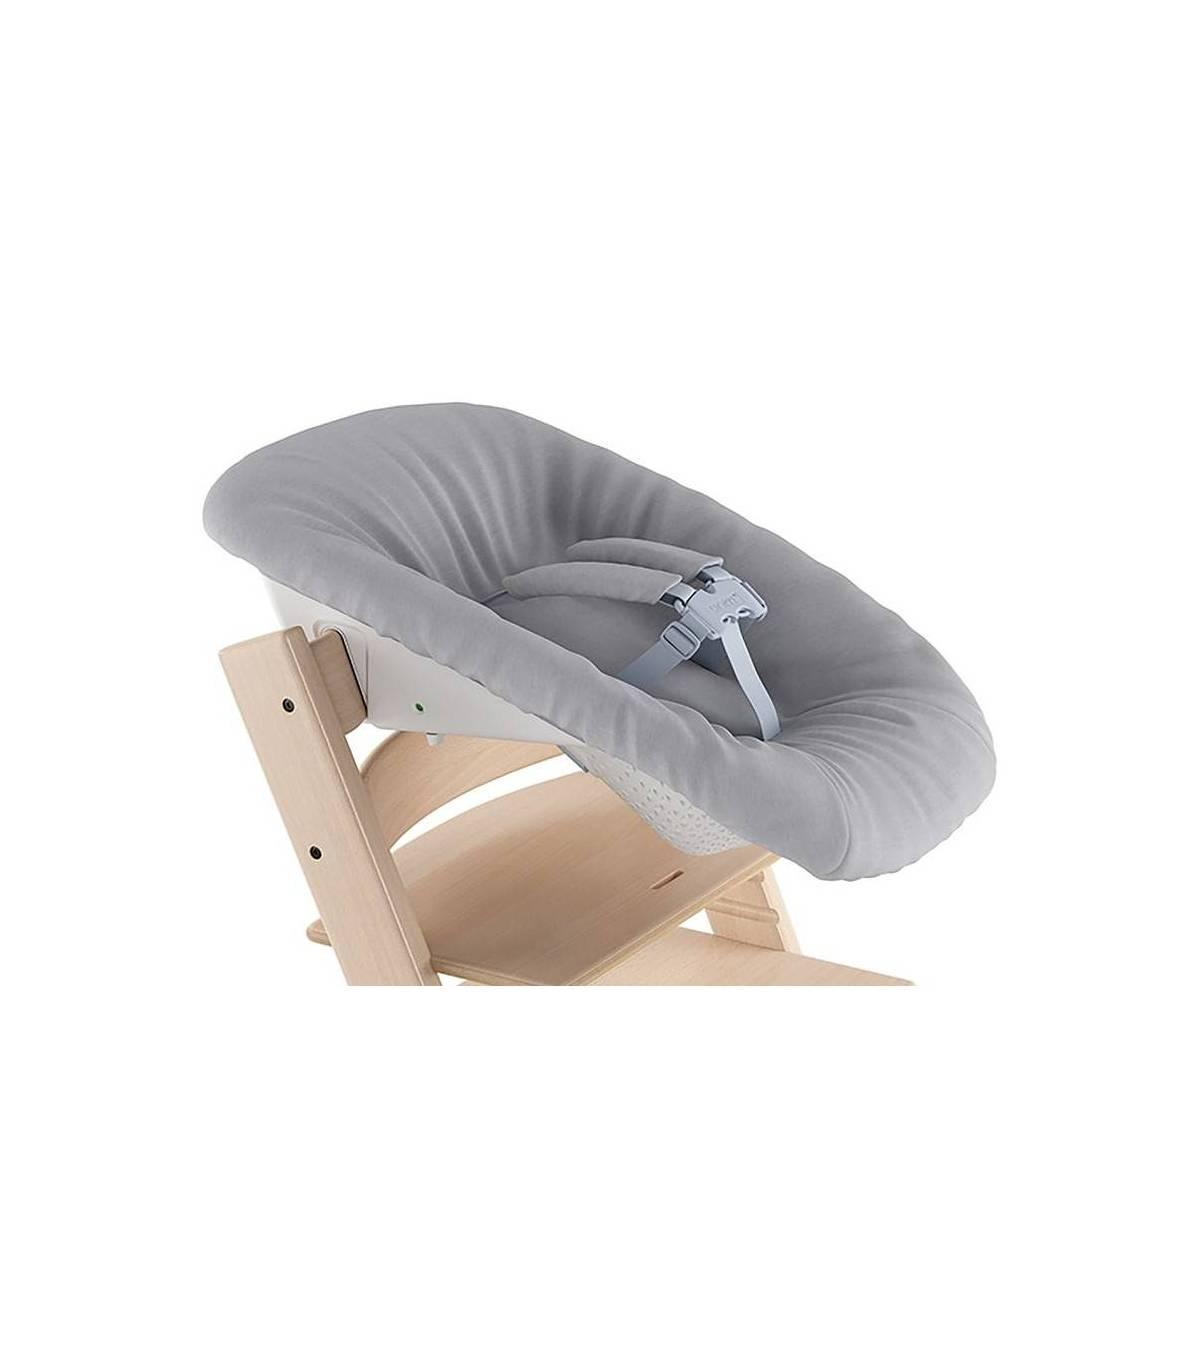 Stokke Tripp Trapp Newborn Set Grey